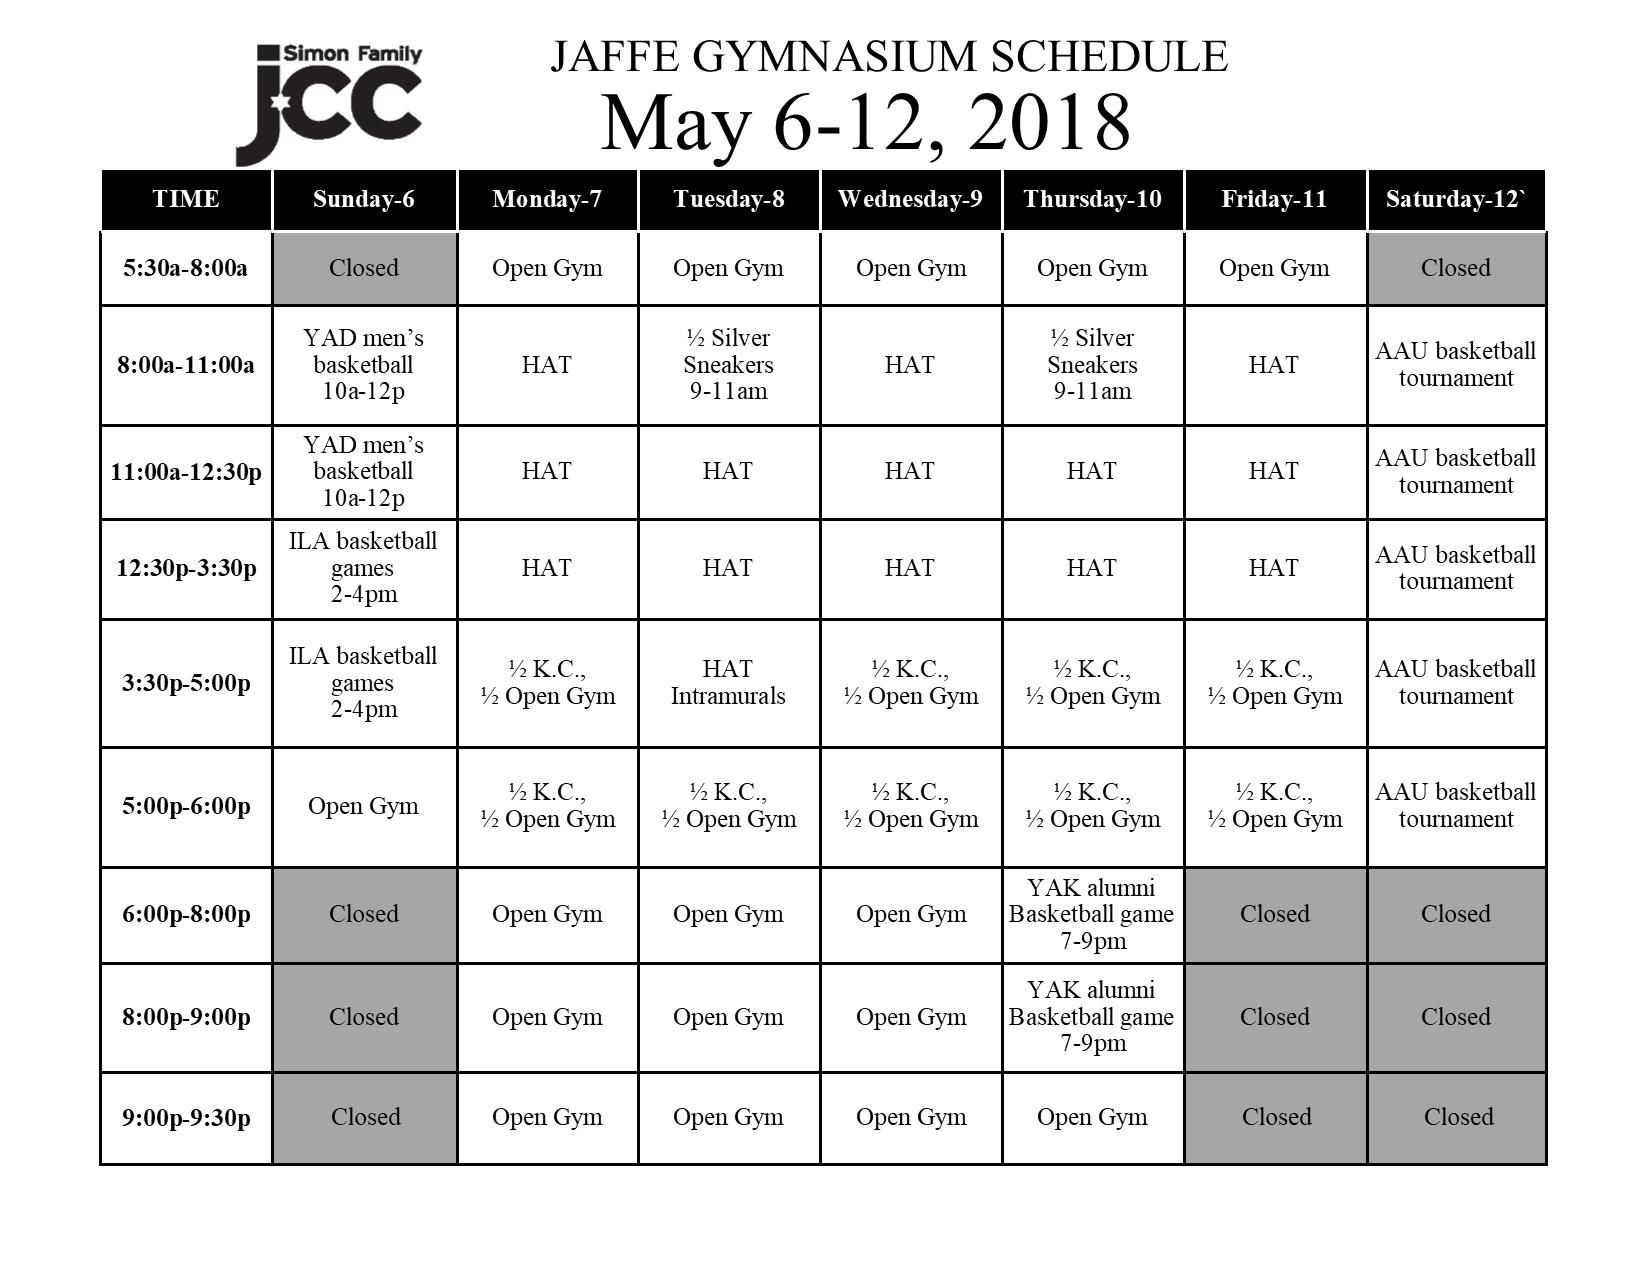 May 6-12 2018 Jaffe Gym Schedule